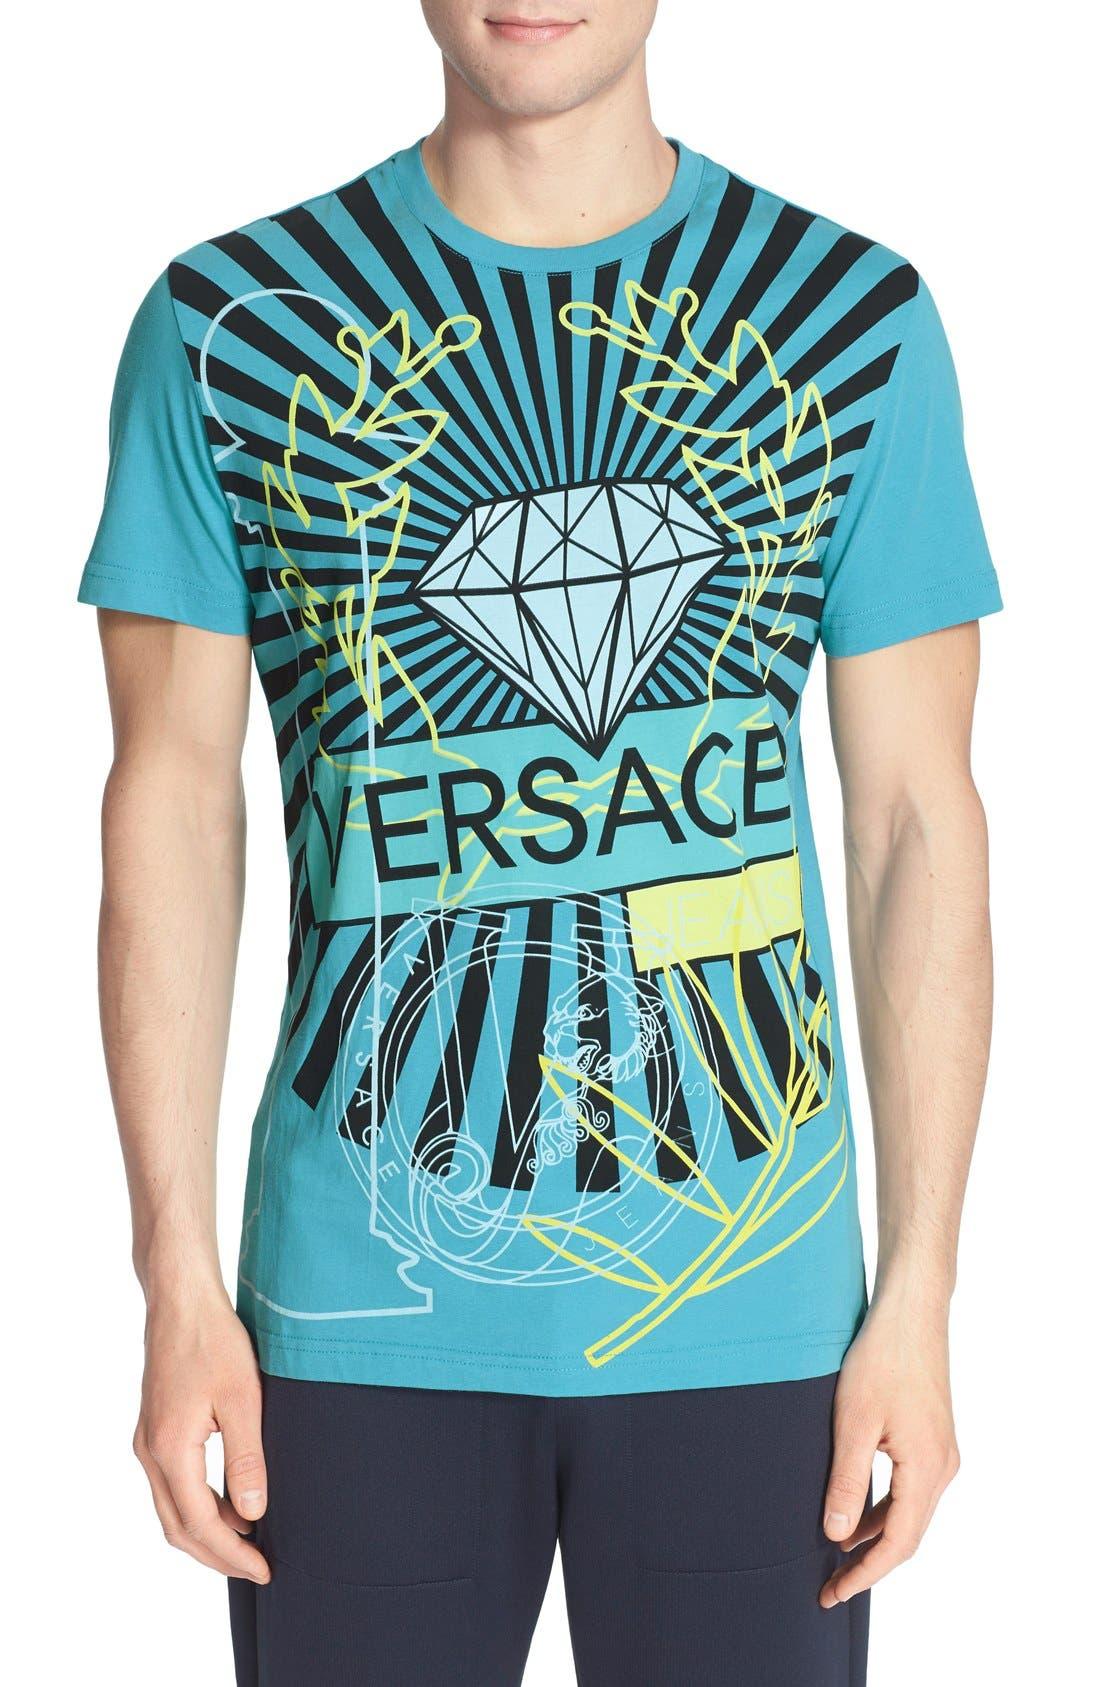 VERSACE JEANS,                             Diamond Print T-Shirt,                             Main thumbnail 1, color,                             440